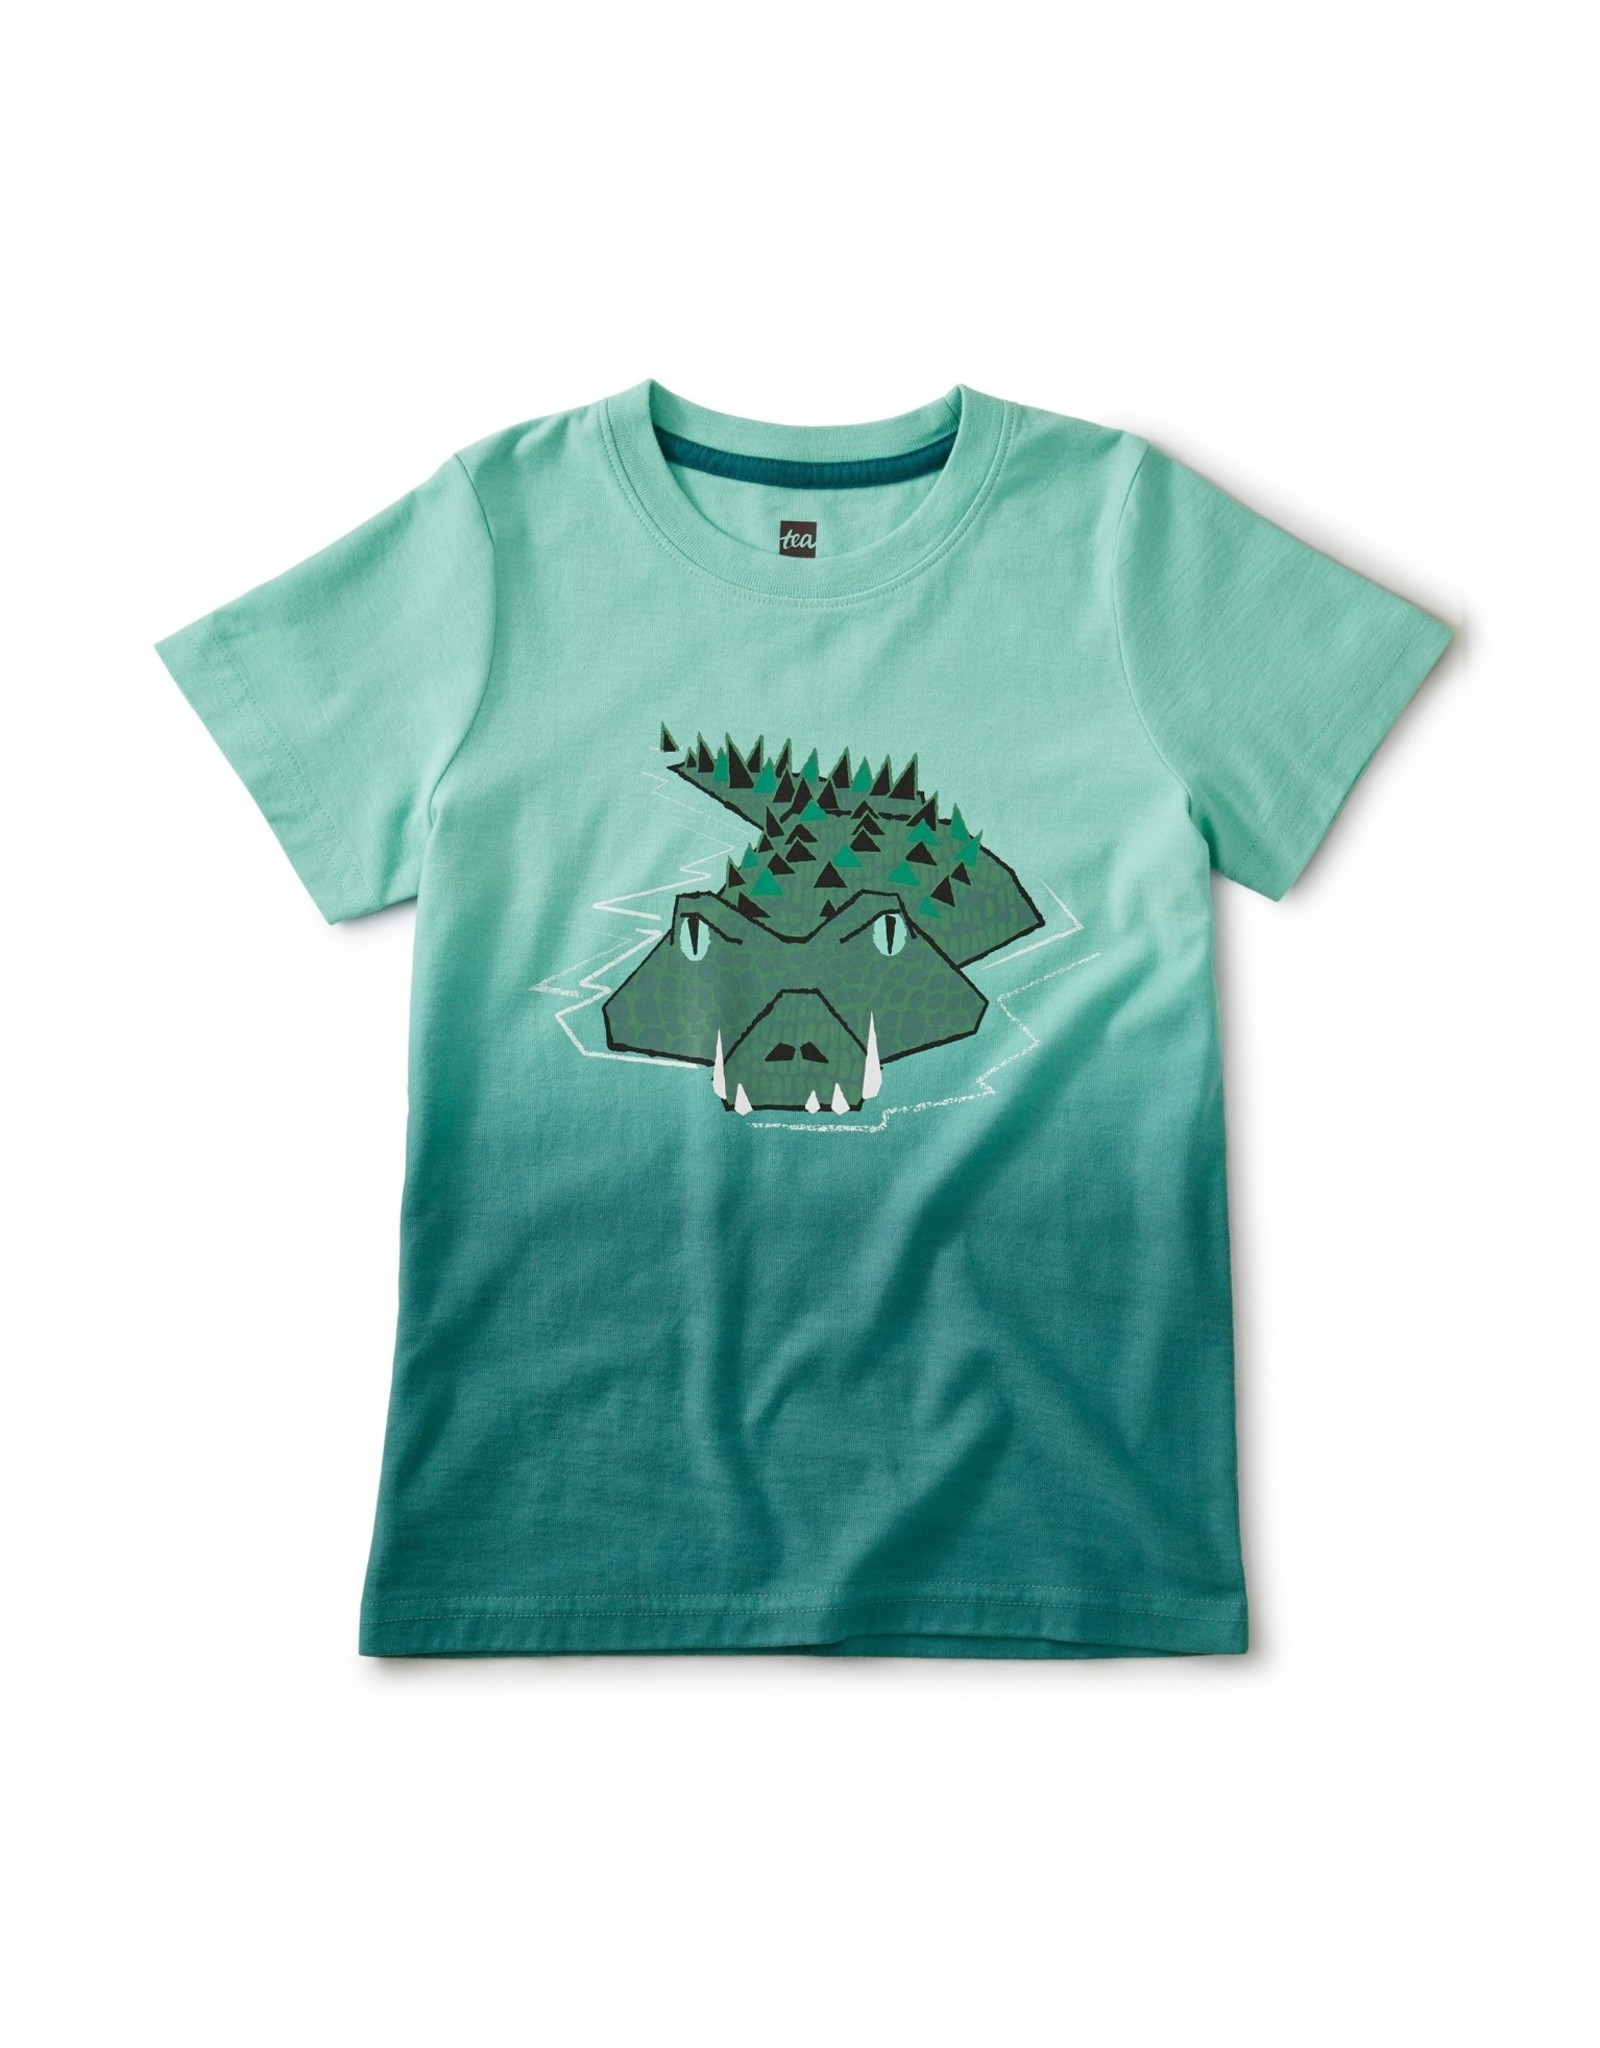 Tea Dip Dye Crocodile Swamp Tee 2SP20